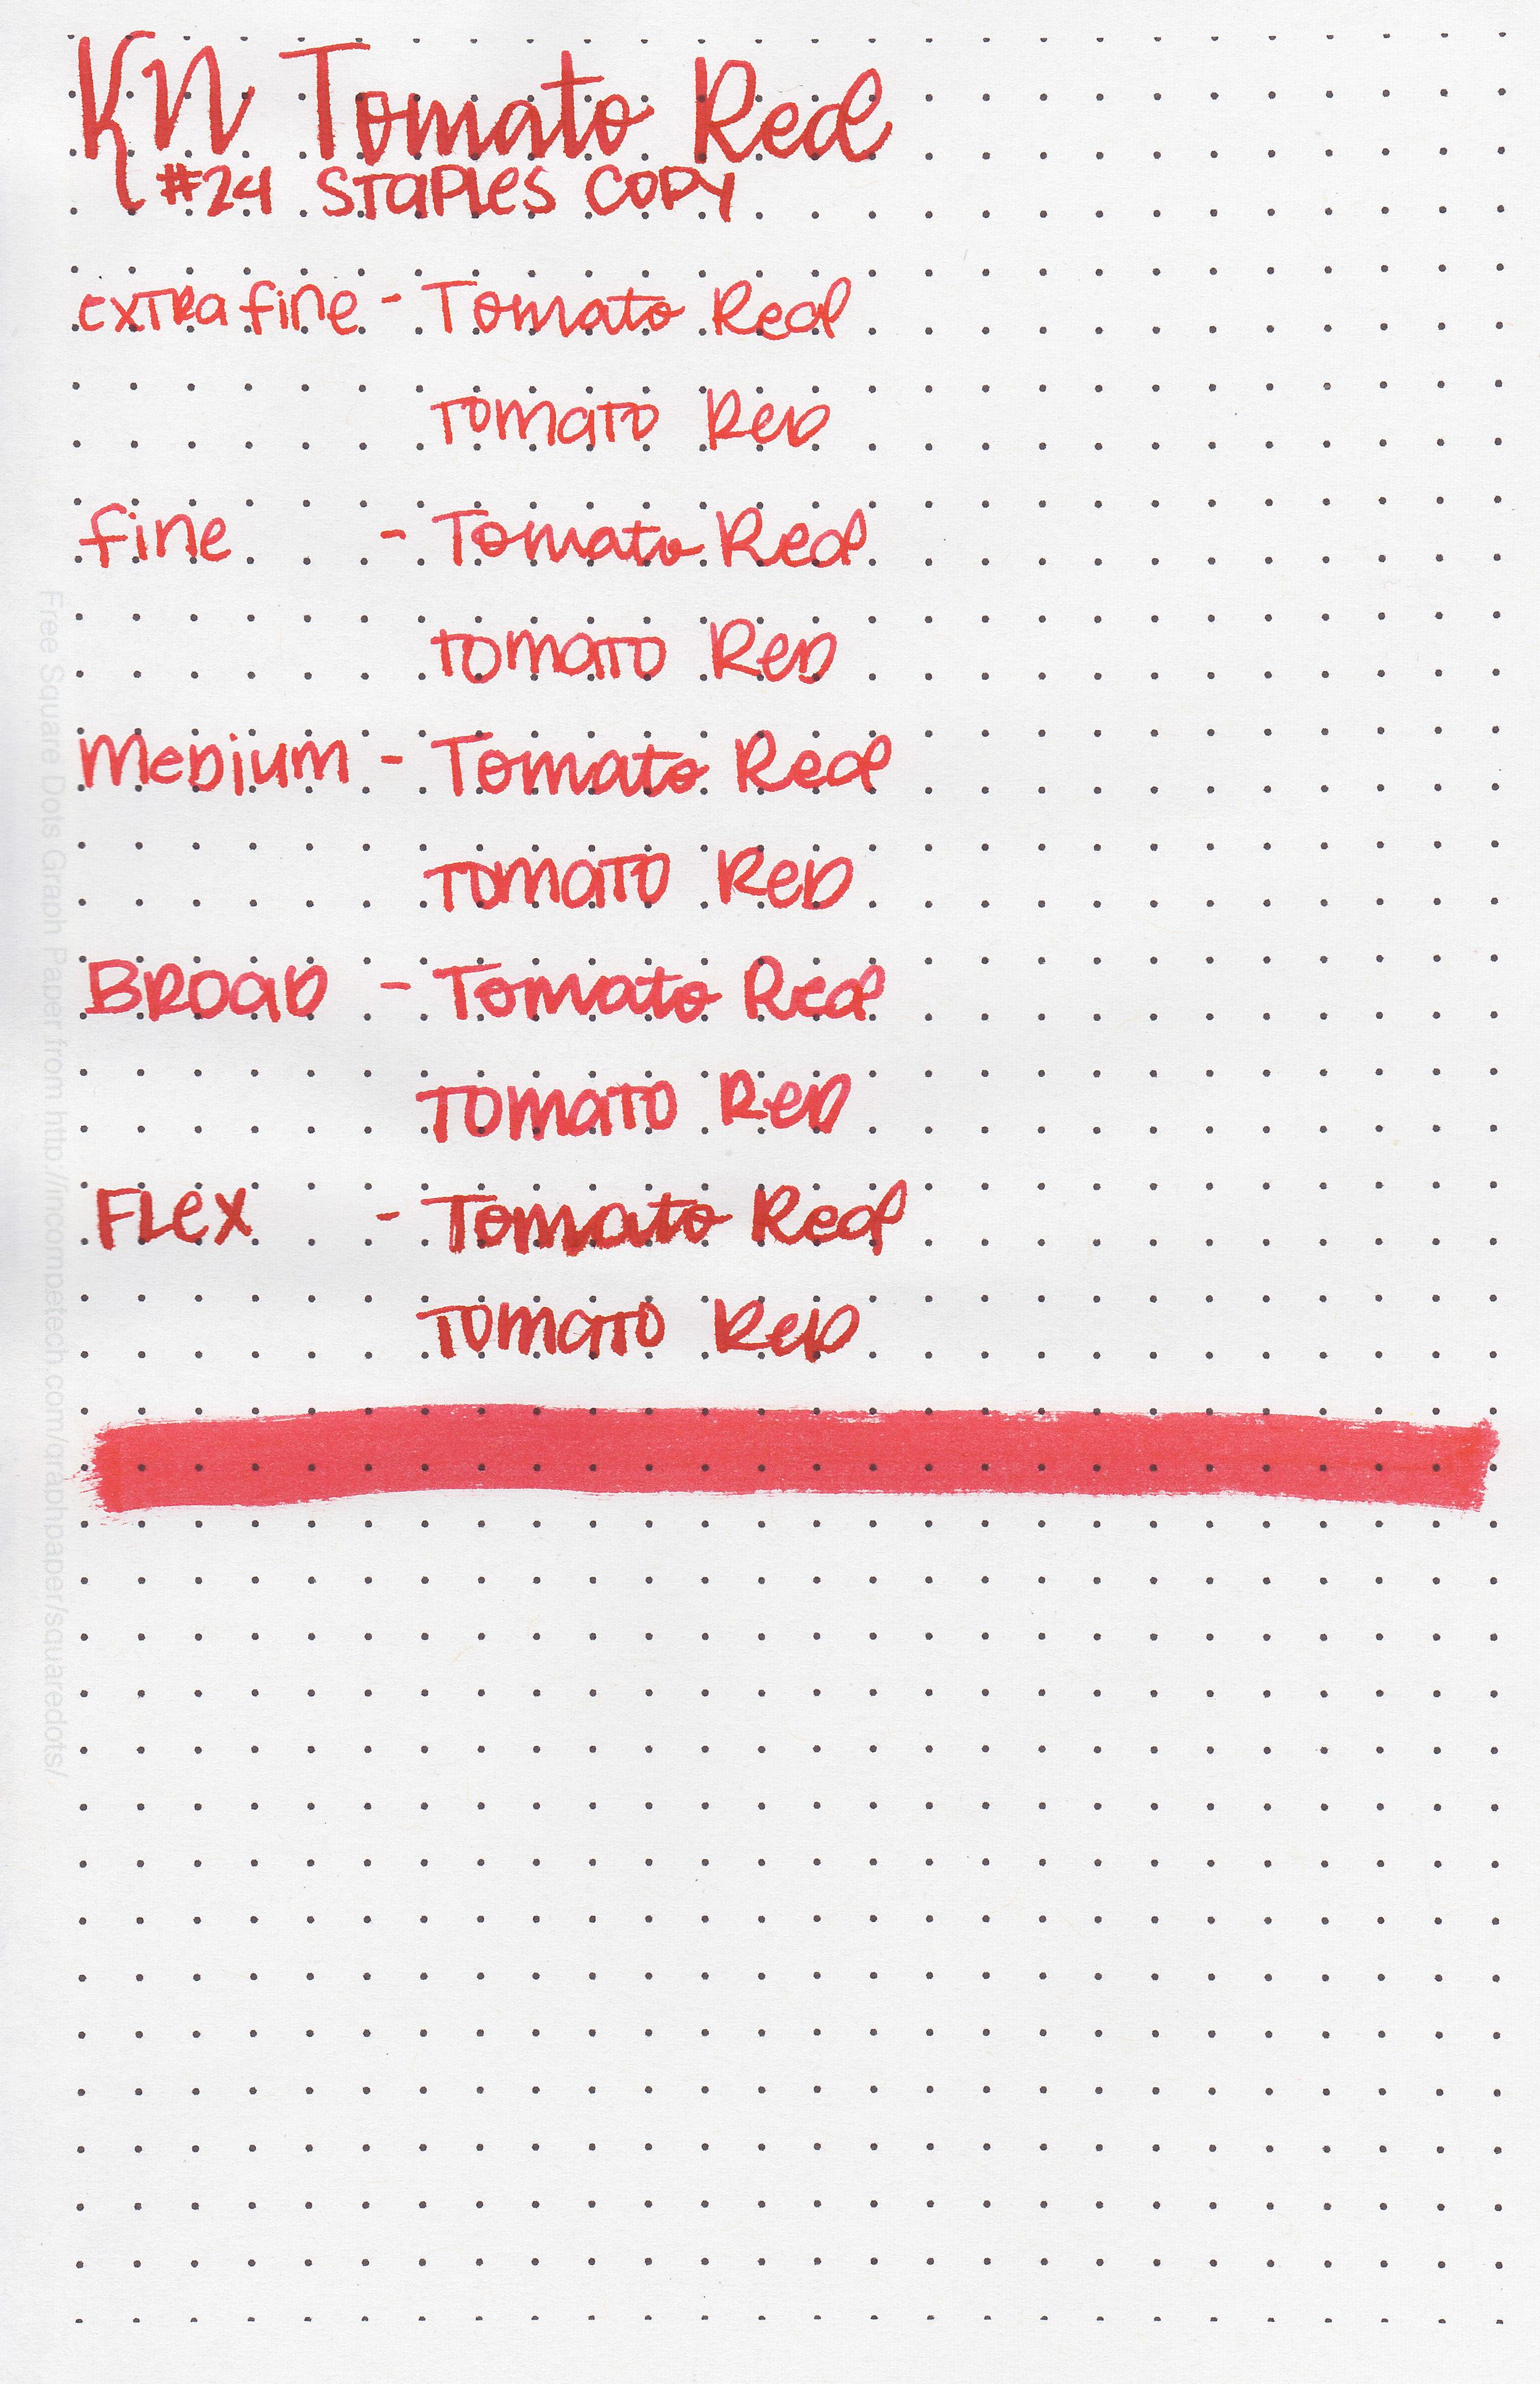 kn-tomato-red-9.jpg